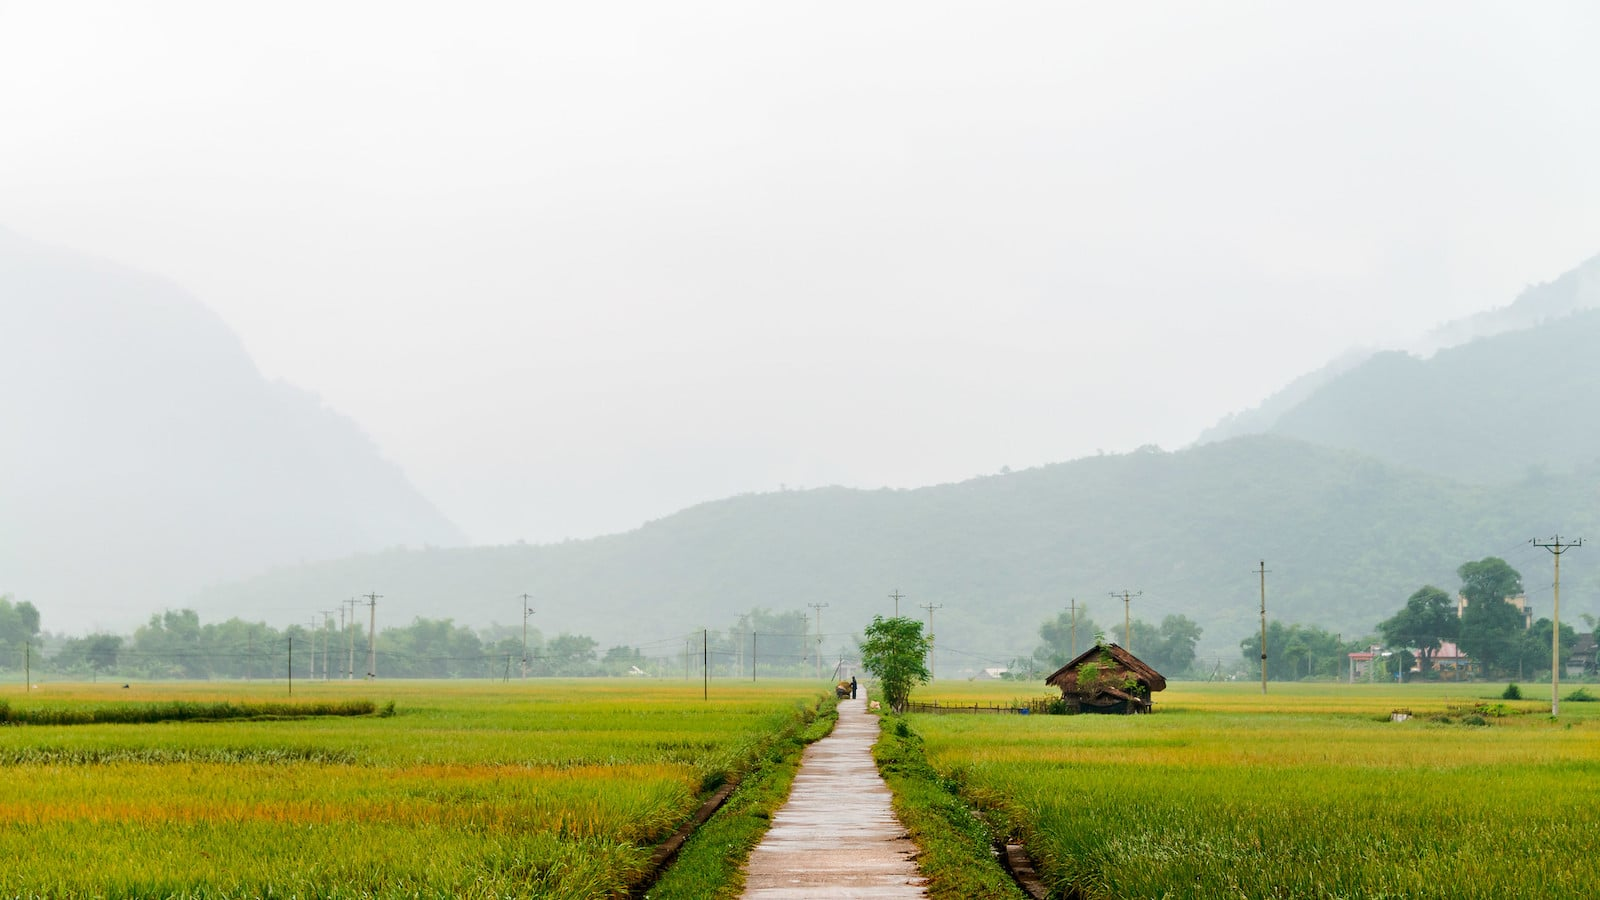 Image of a misty rain in Mai Chau, Vietnam